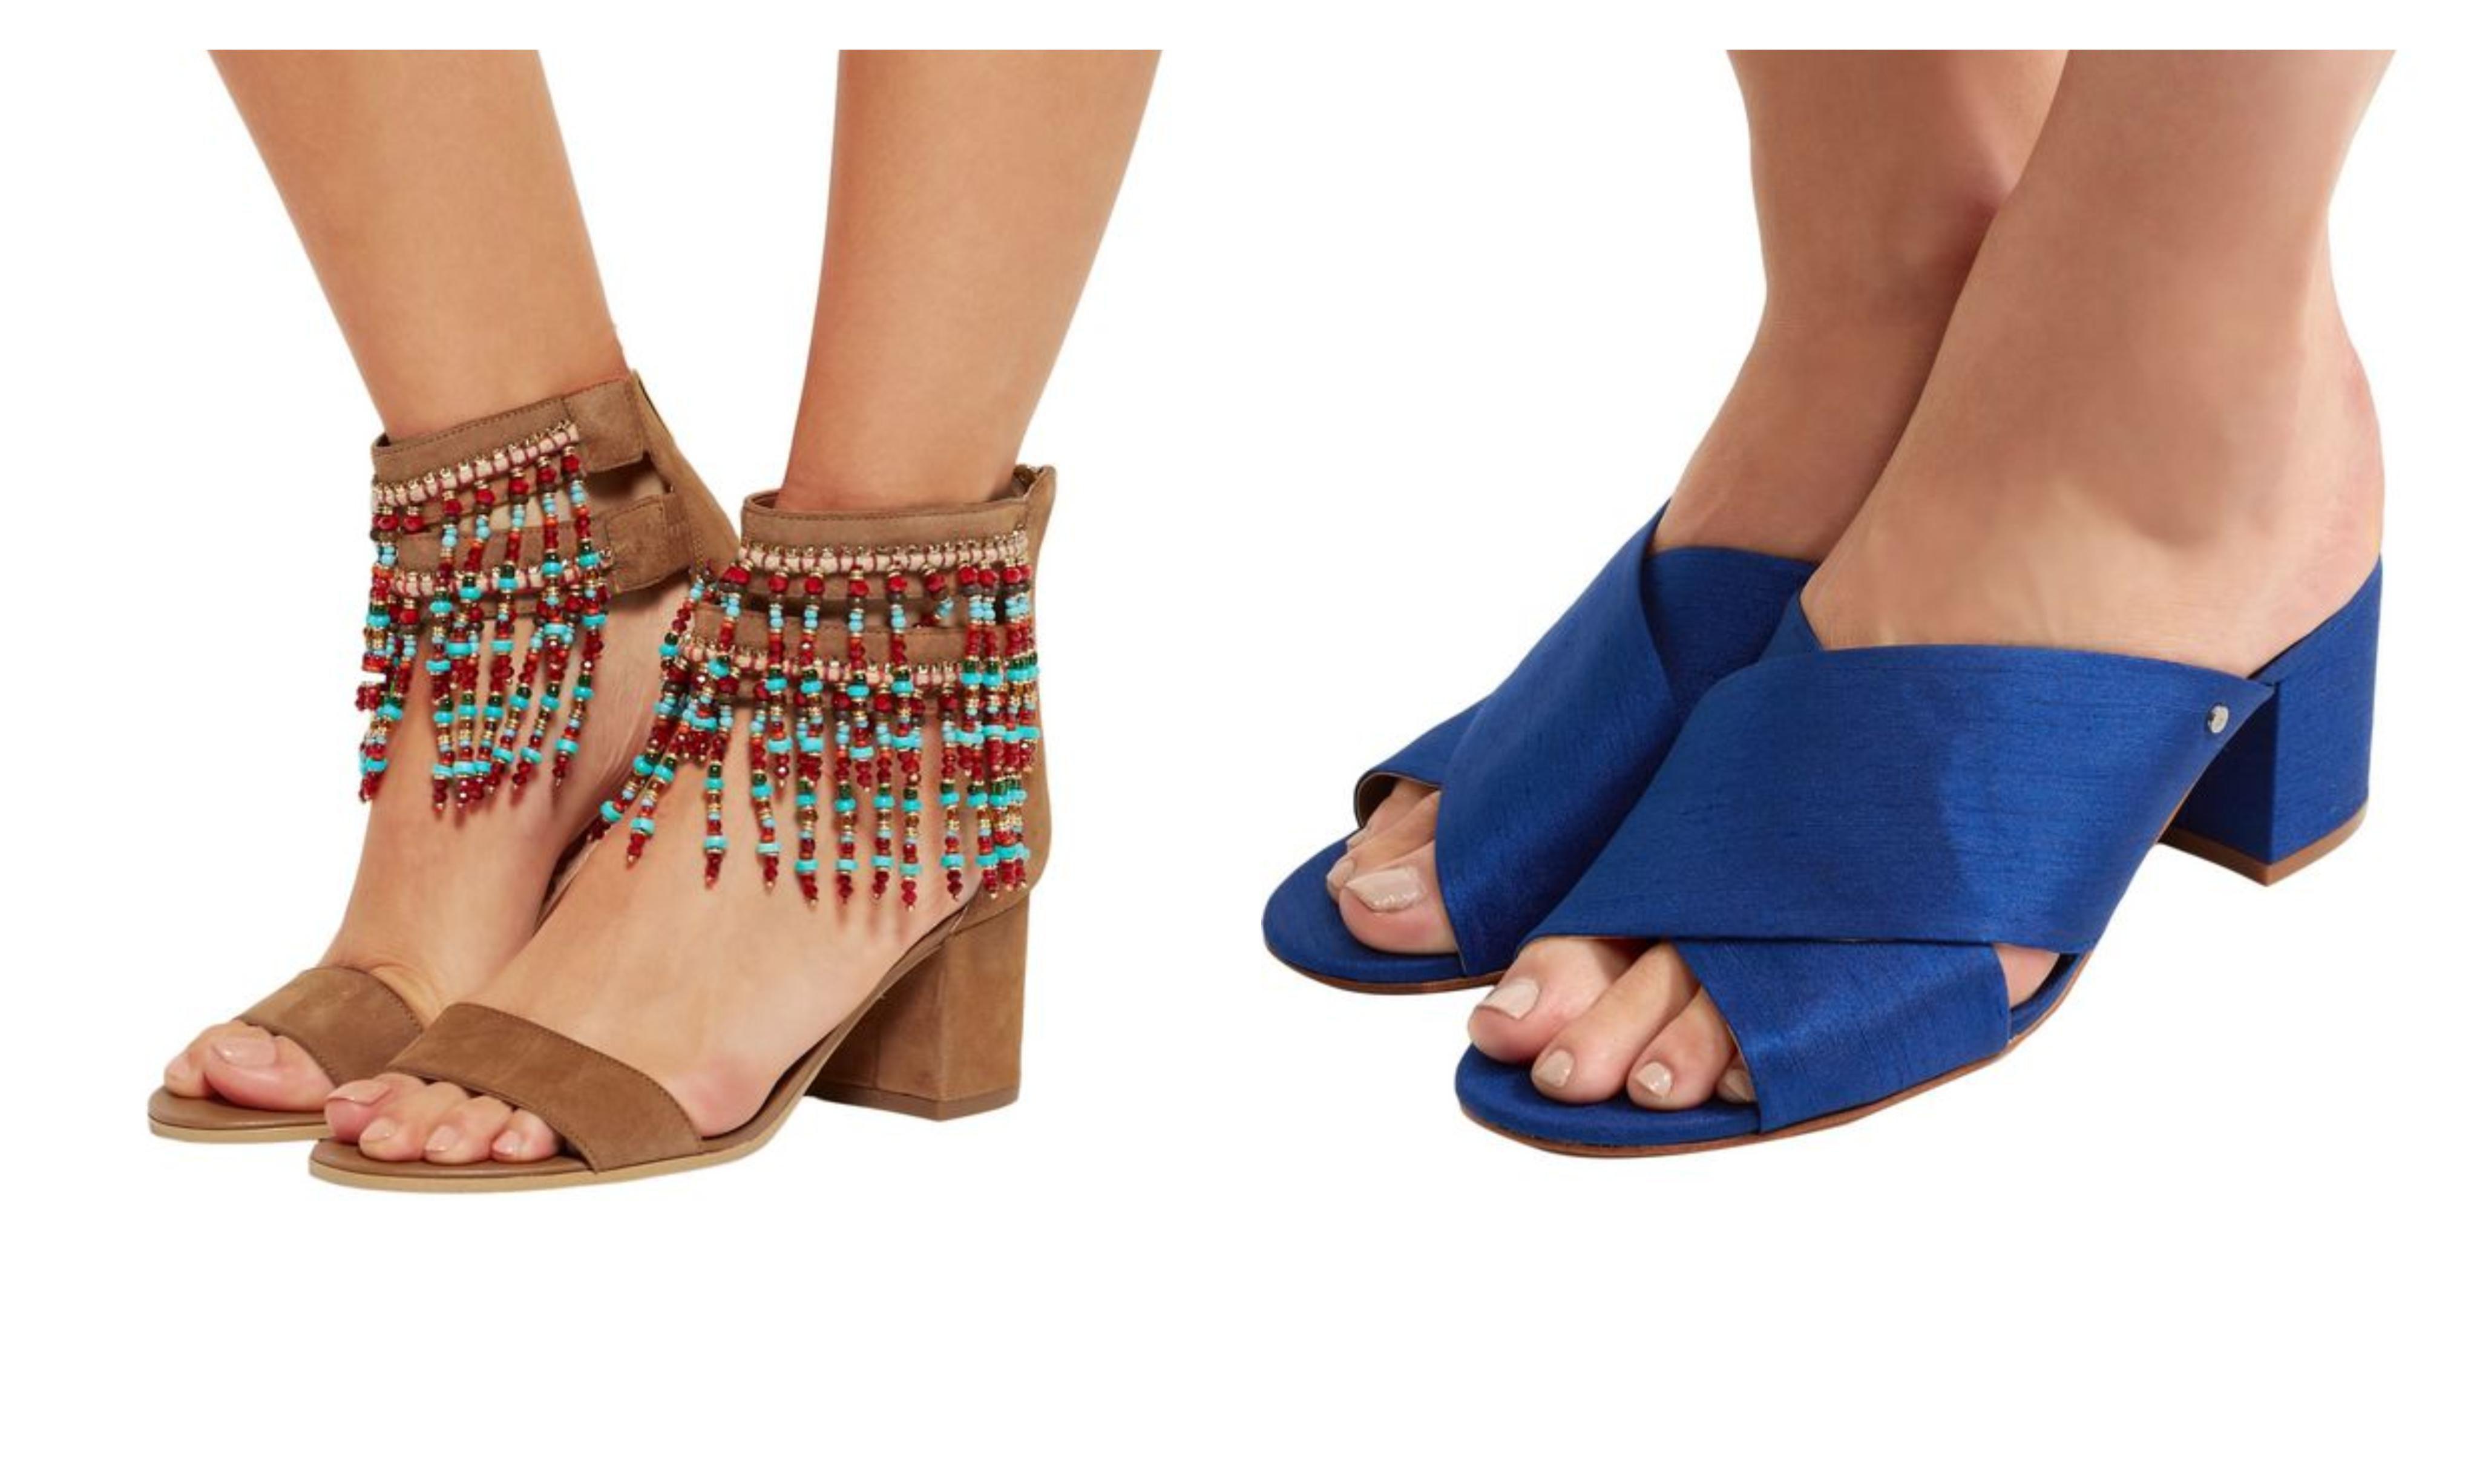 Zavirili smo na Outnet i pronašli 10 modela genijalnih dizajnerskih cipela do 85 eura!